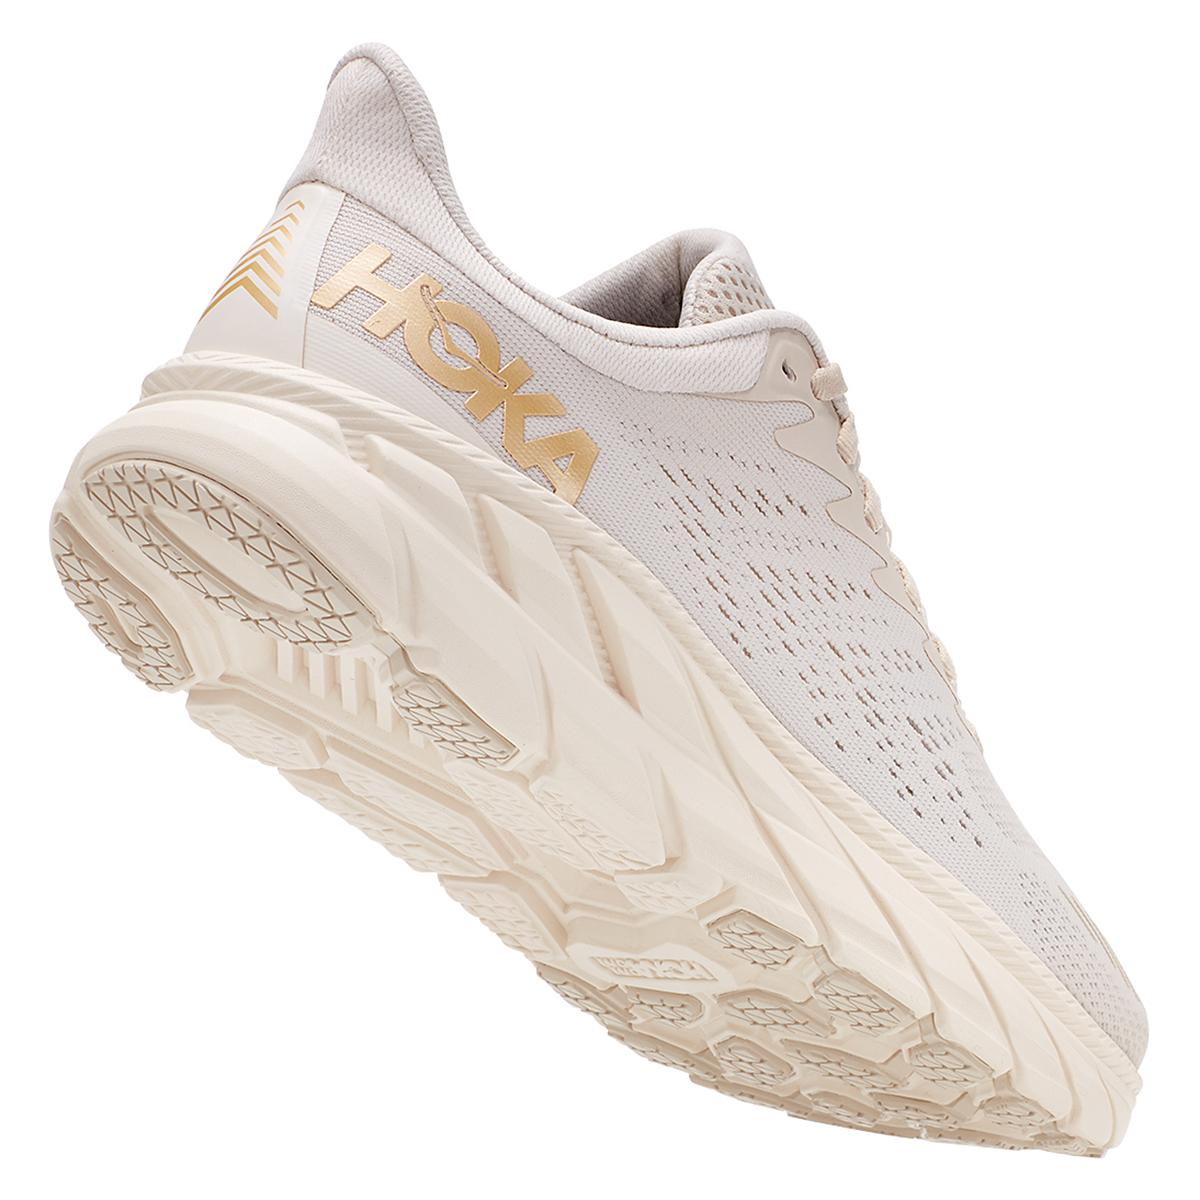 Women's Hoka One One Clifton 7 Running Shoe - Color: Almond Milk/Bronze - Size: 5 - Width: Regular, Almond Milk/Bronze, large, image 3